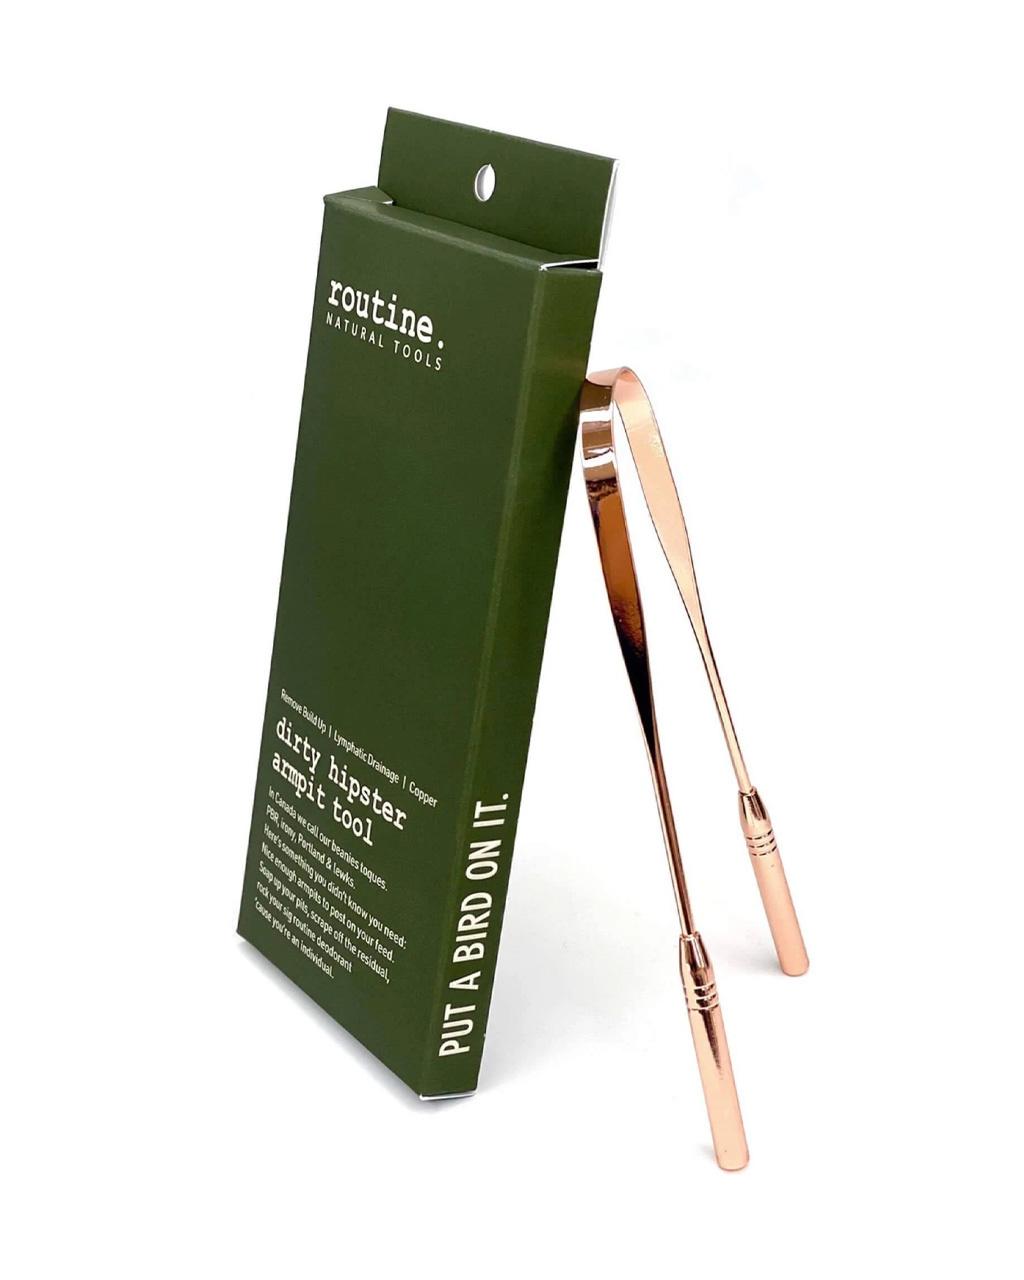 Routine Natural Goods Routine Armpit Tool